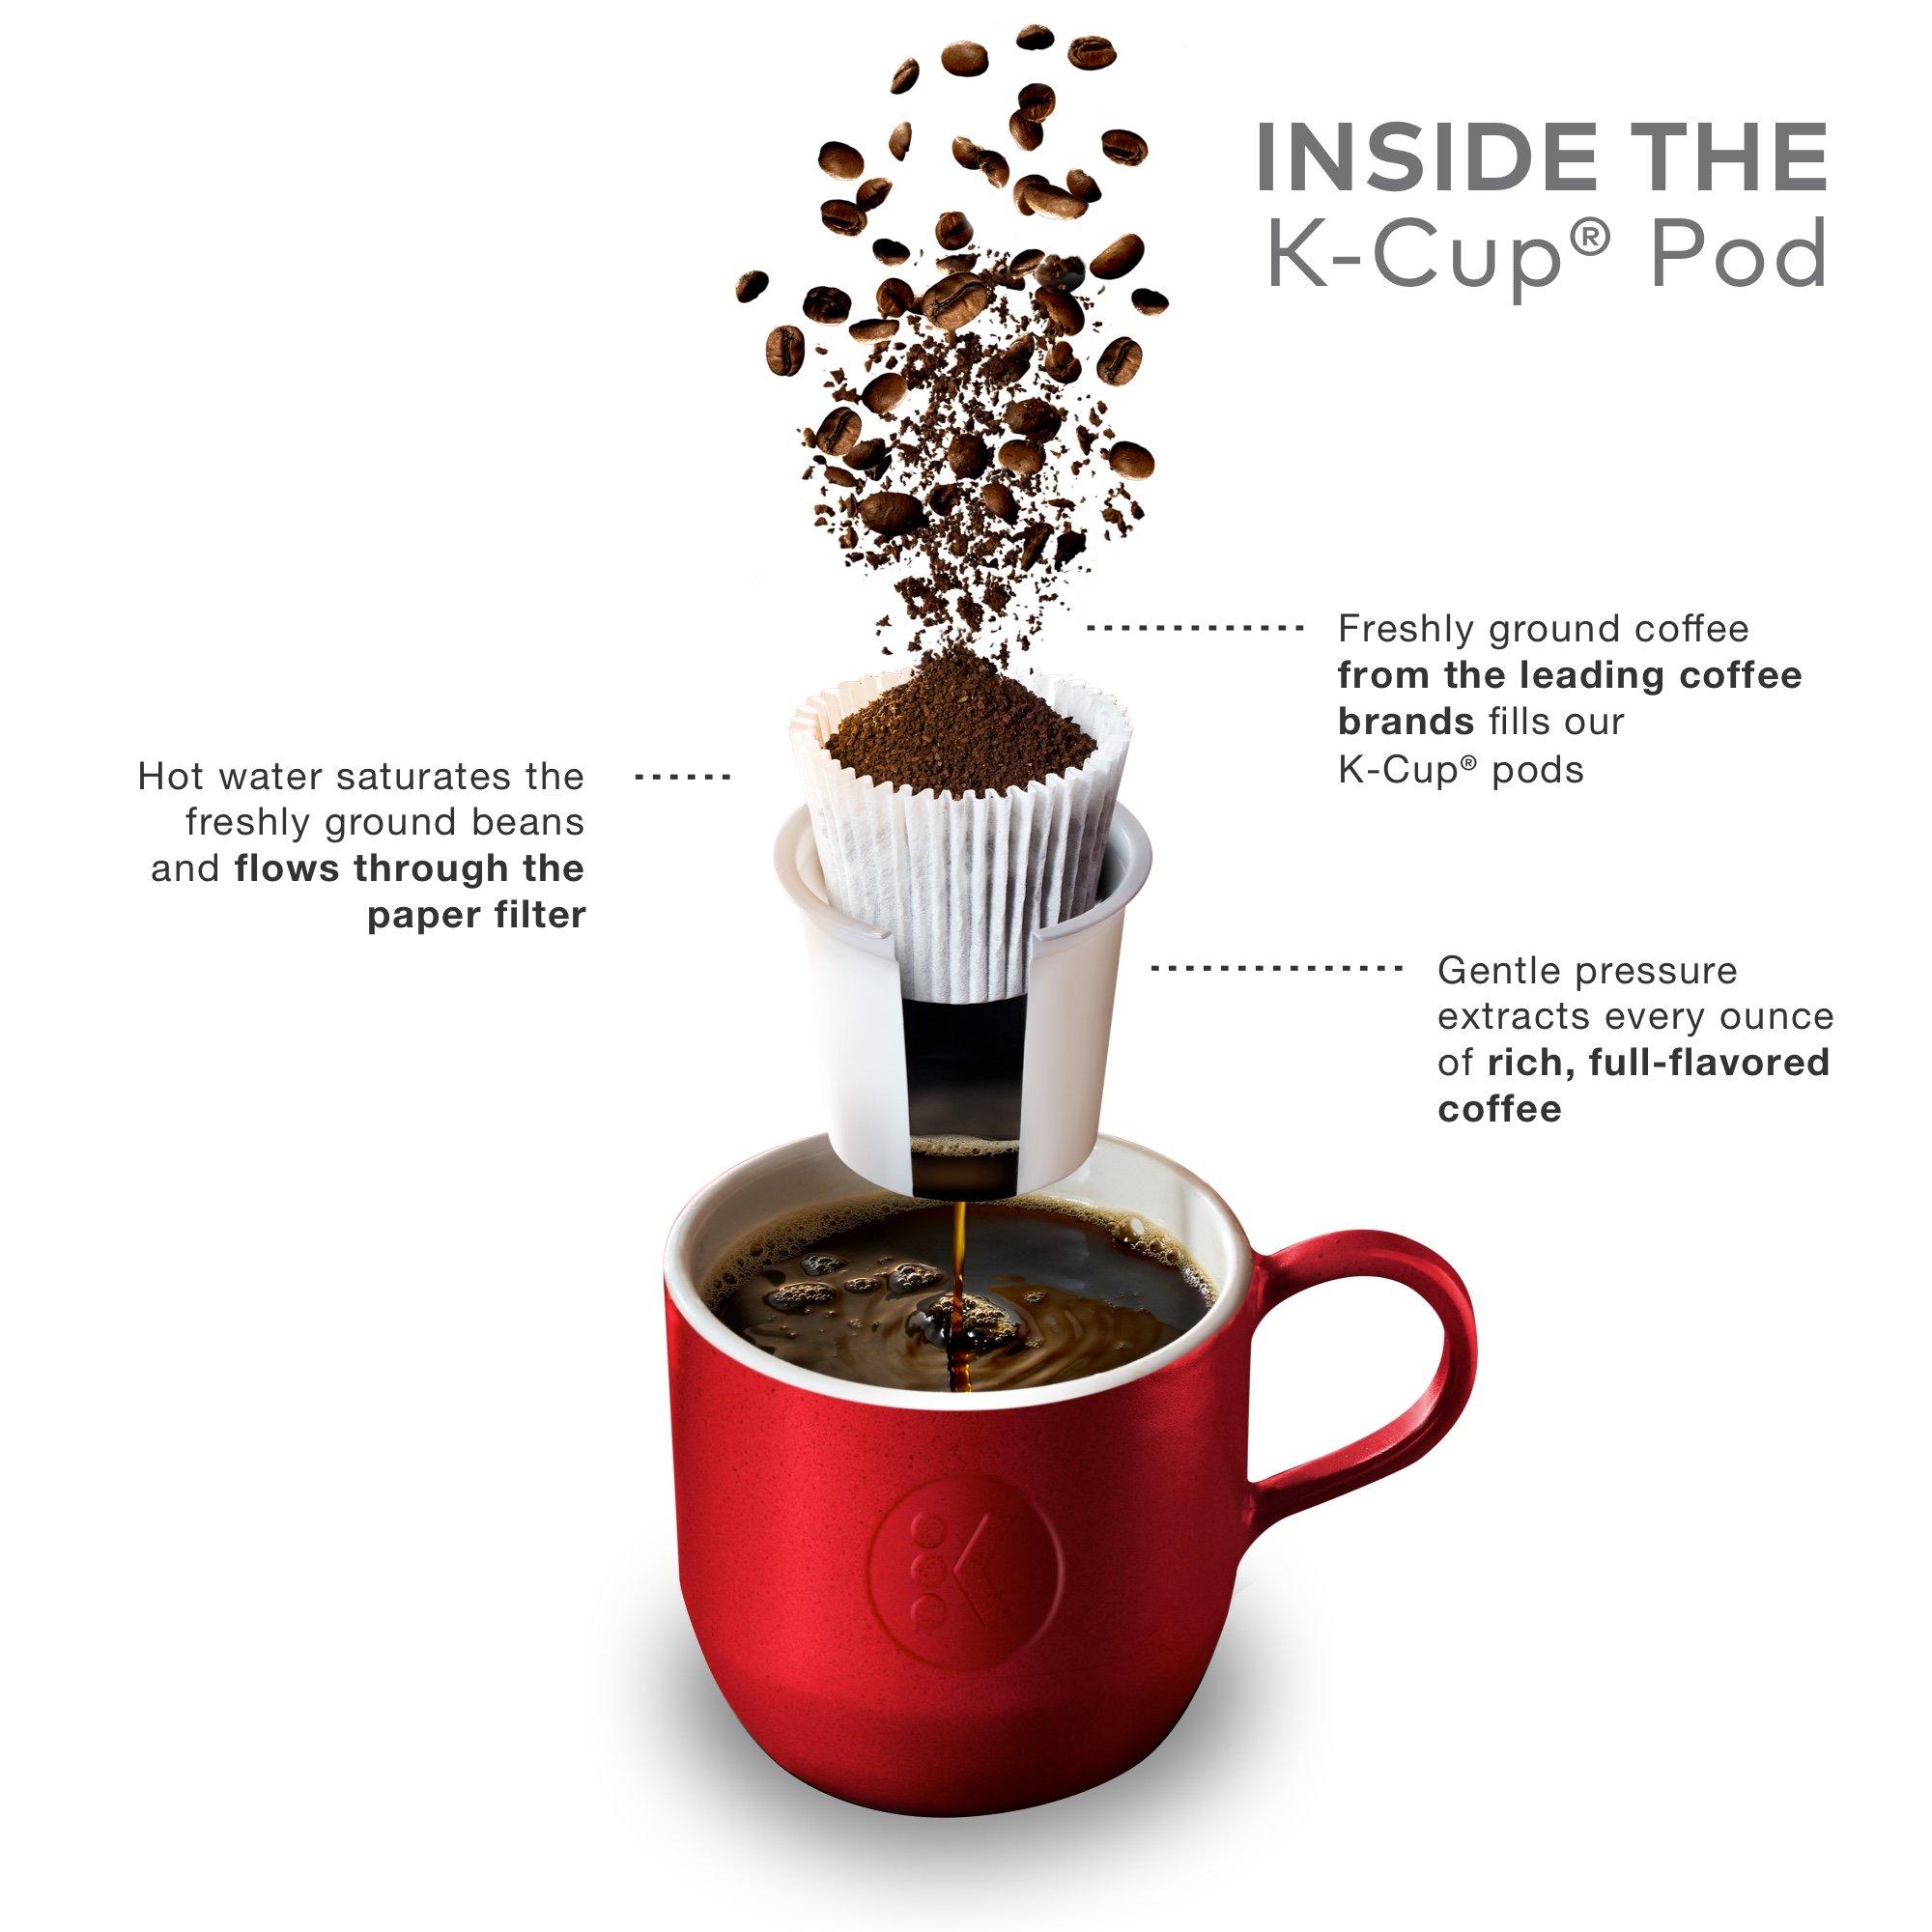 The Original Donut Shop Coffee, Regular Medium Roast, K-Cup Portion Count for Keurig Brewers 24-Count (Pack of 4) by The Original Donut Shop (Image #6)